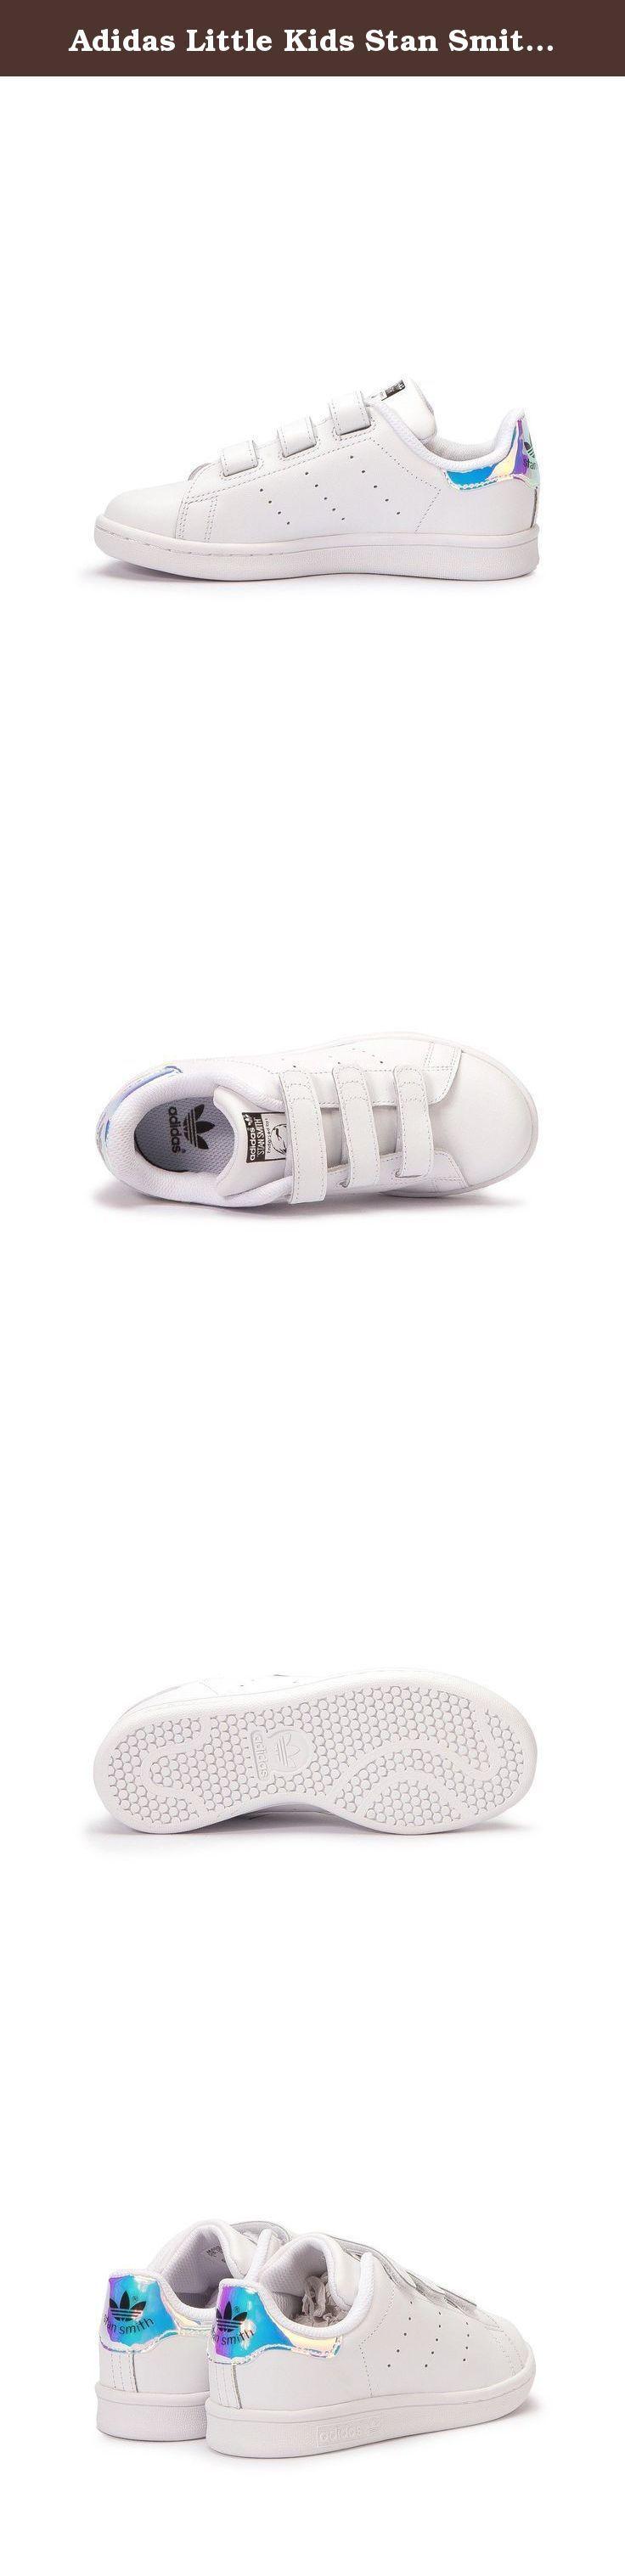 adidas little kids stan smith silver metallic silver footwear white size 2